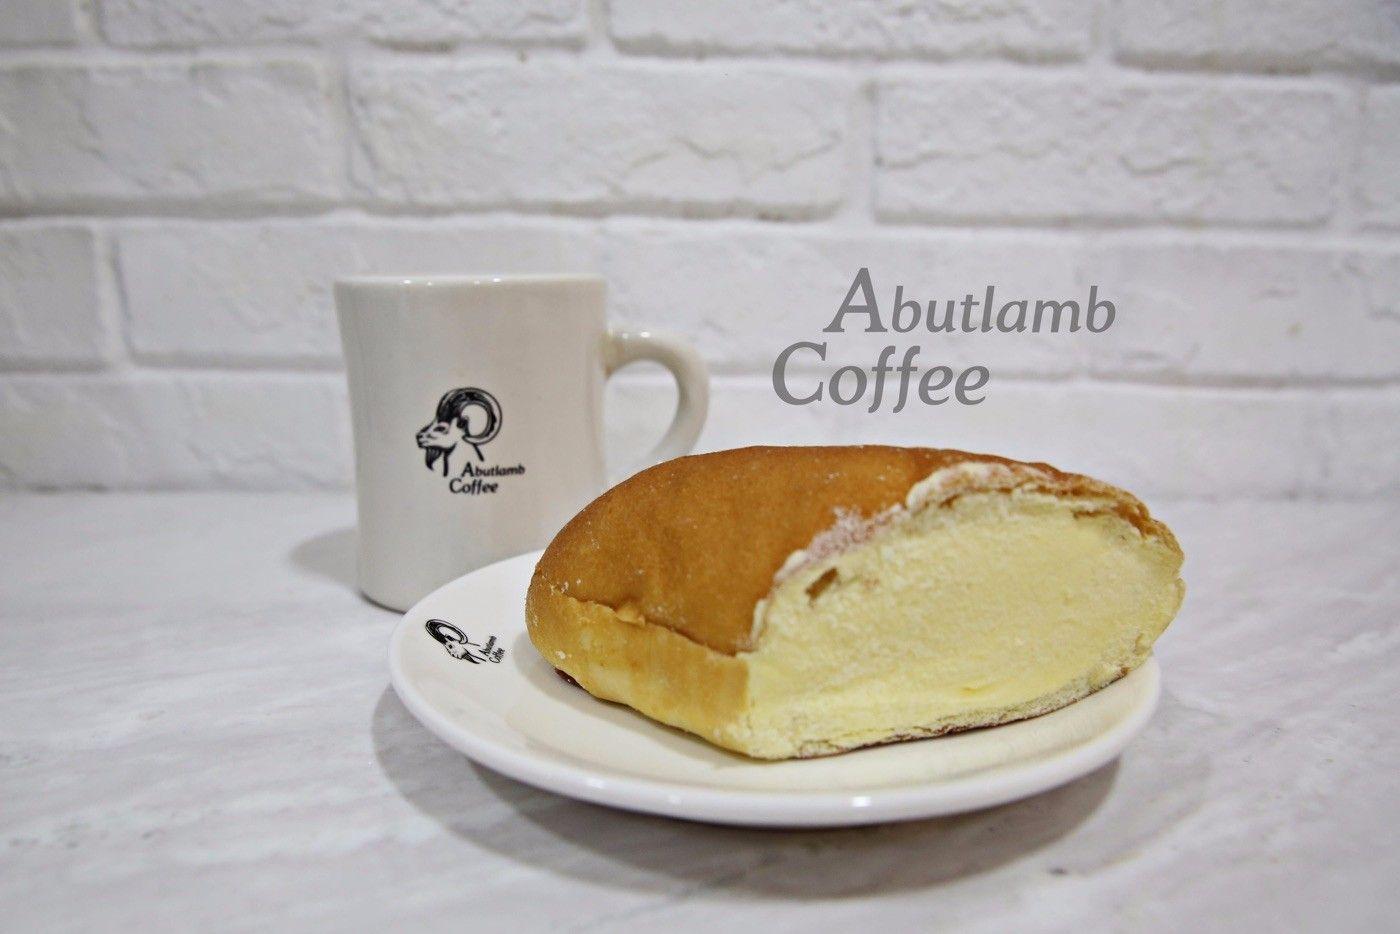 Abutlamb八角杯咖啡